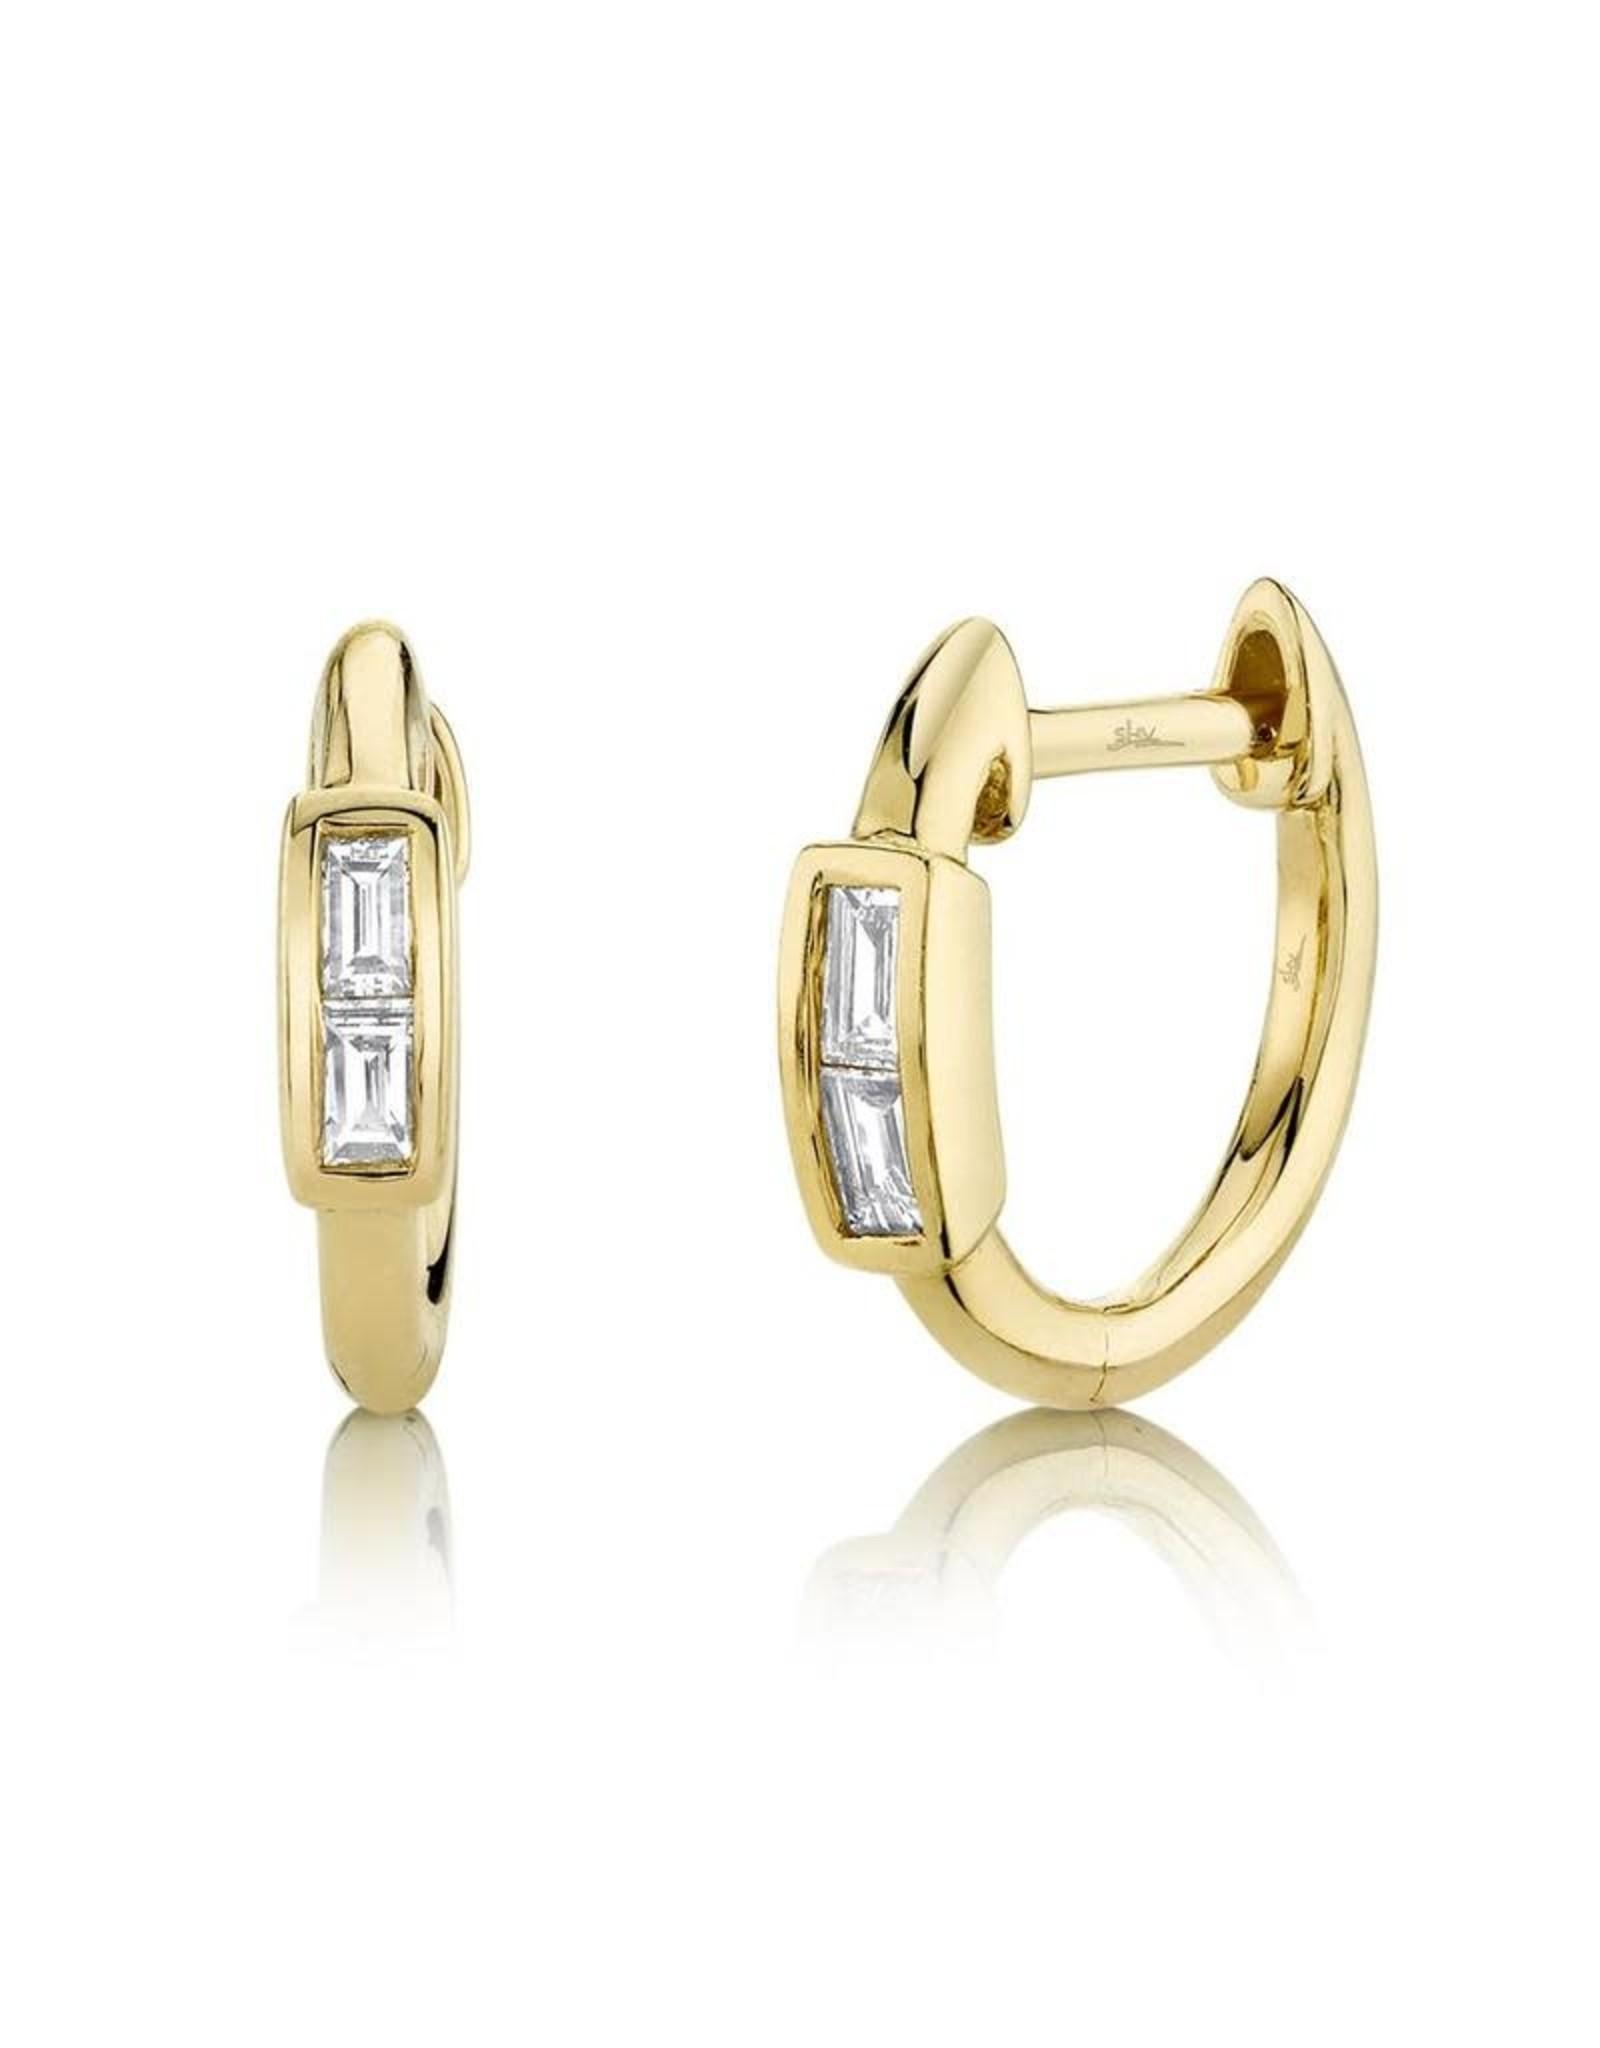 14K Yellow Gold Baguette Huggie Earrings, D: 0.10ct